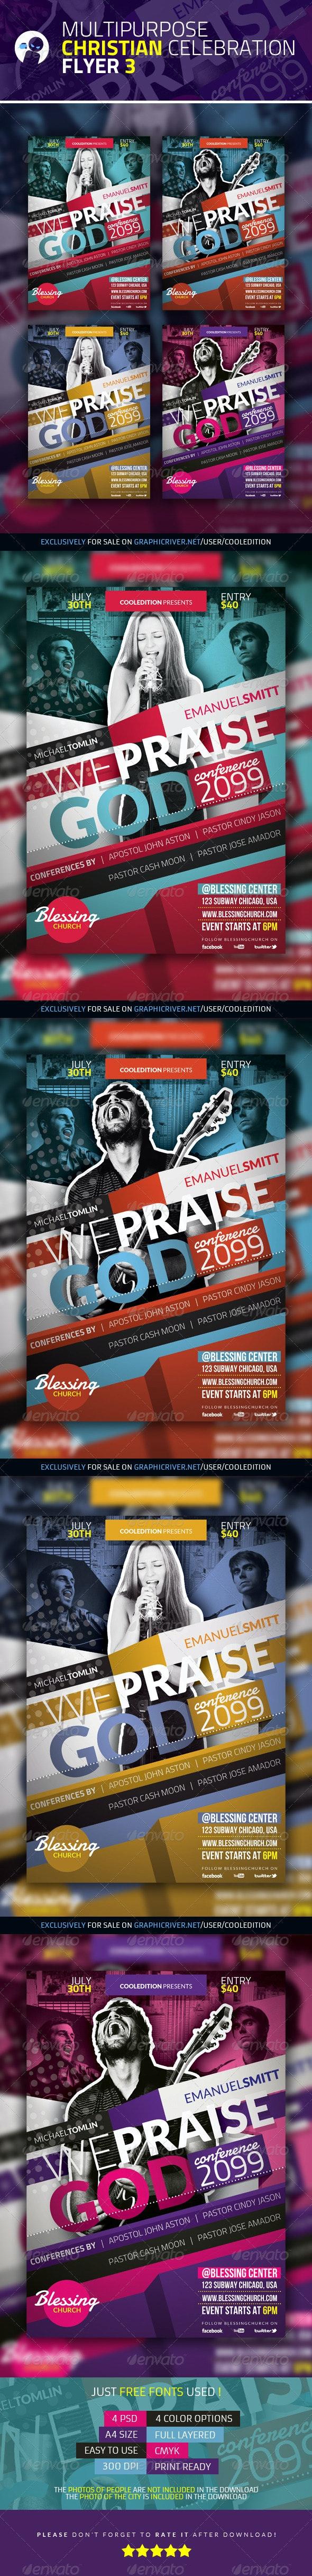 Multipurpose Christian Celebration Flyer 3 - Church Flyers